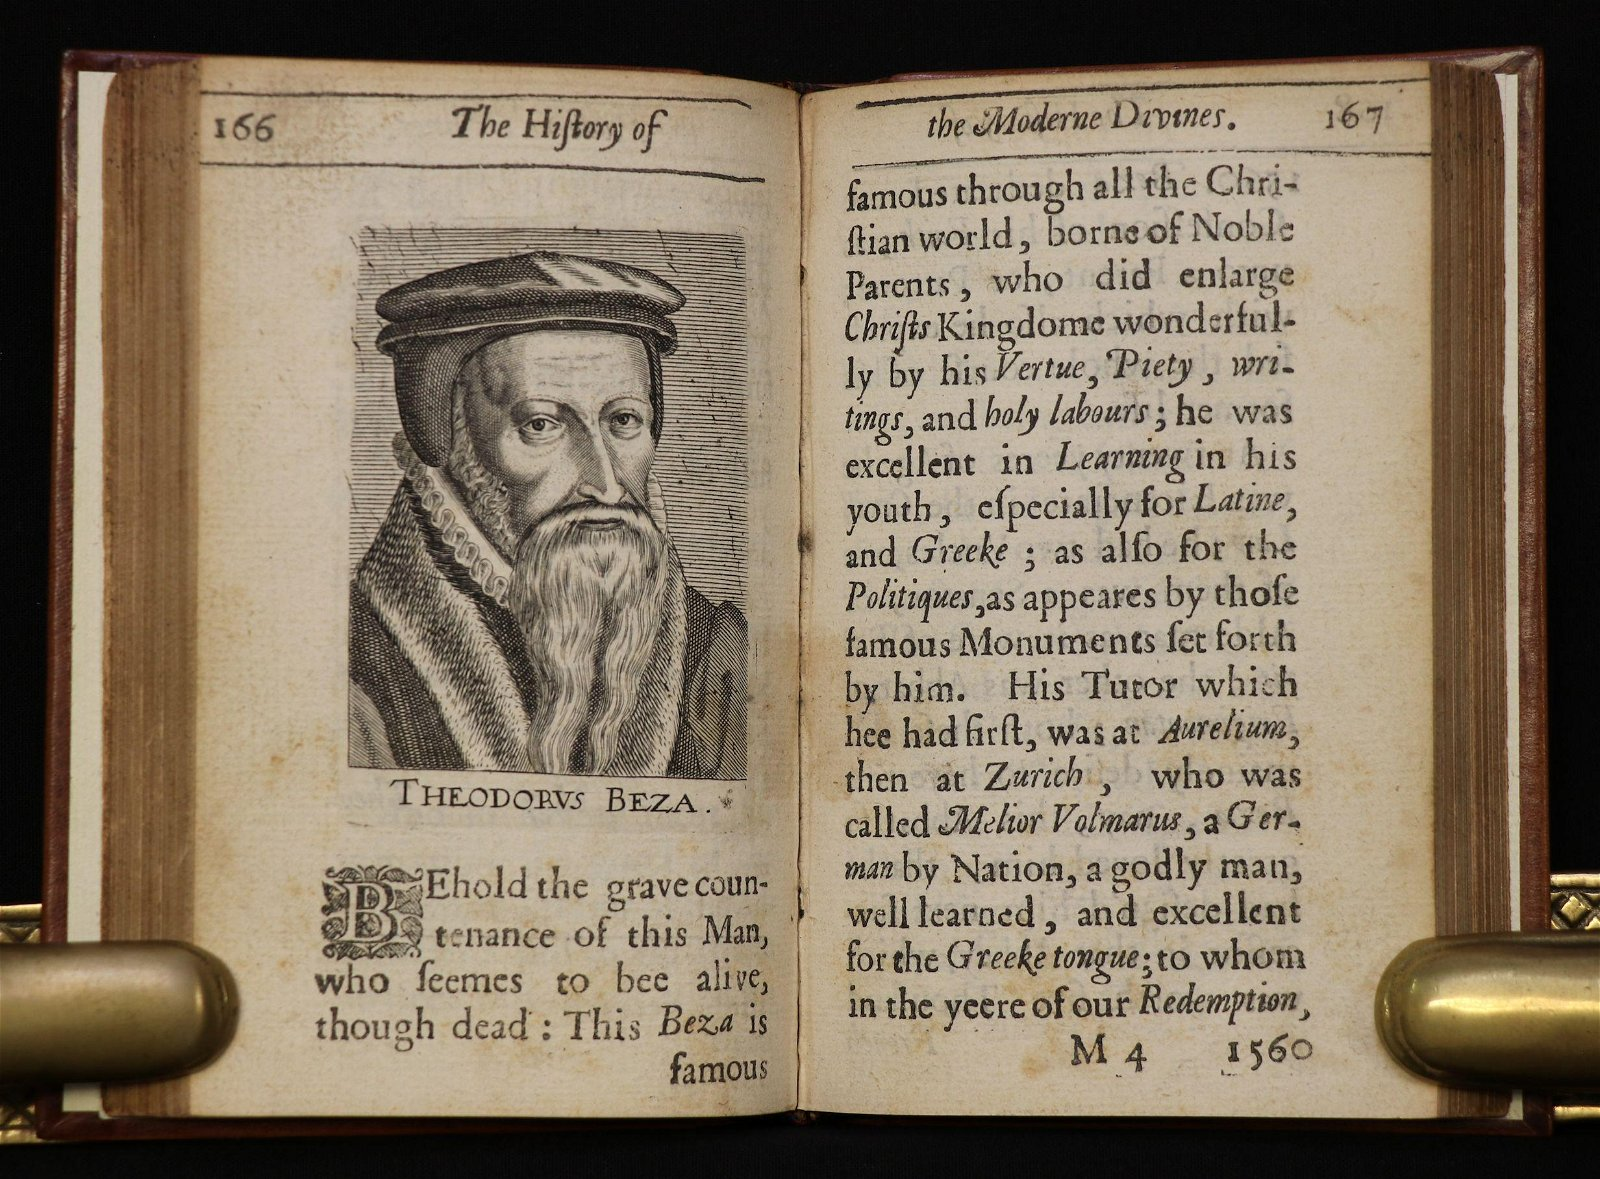 Protestant Divines, 1637